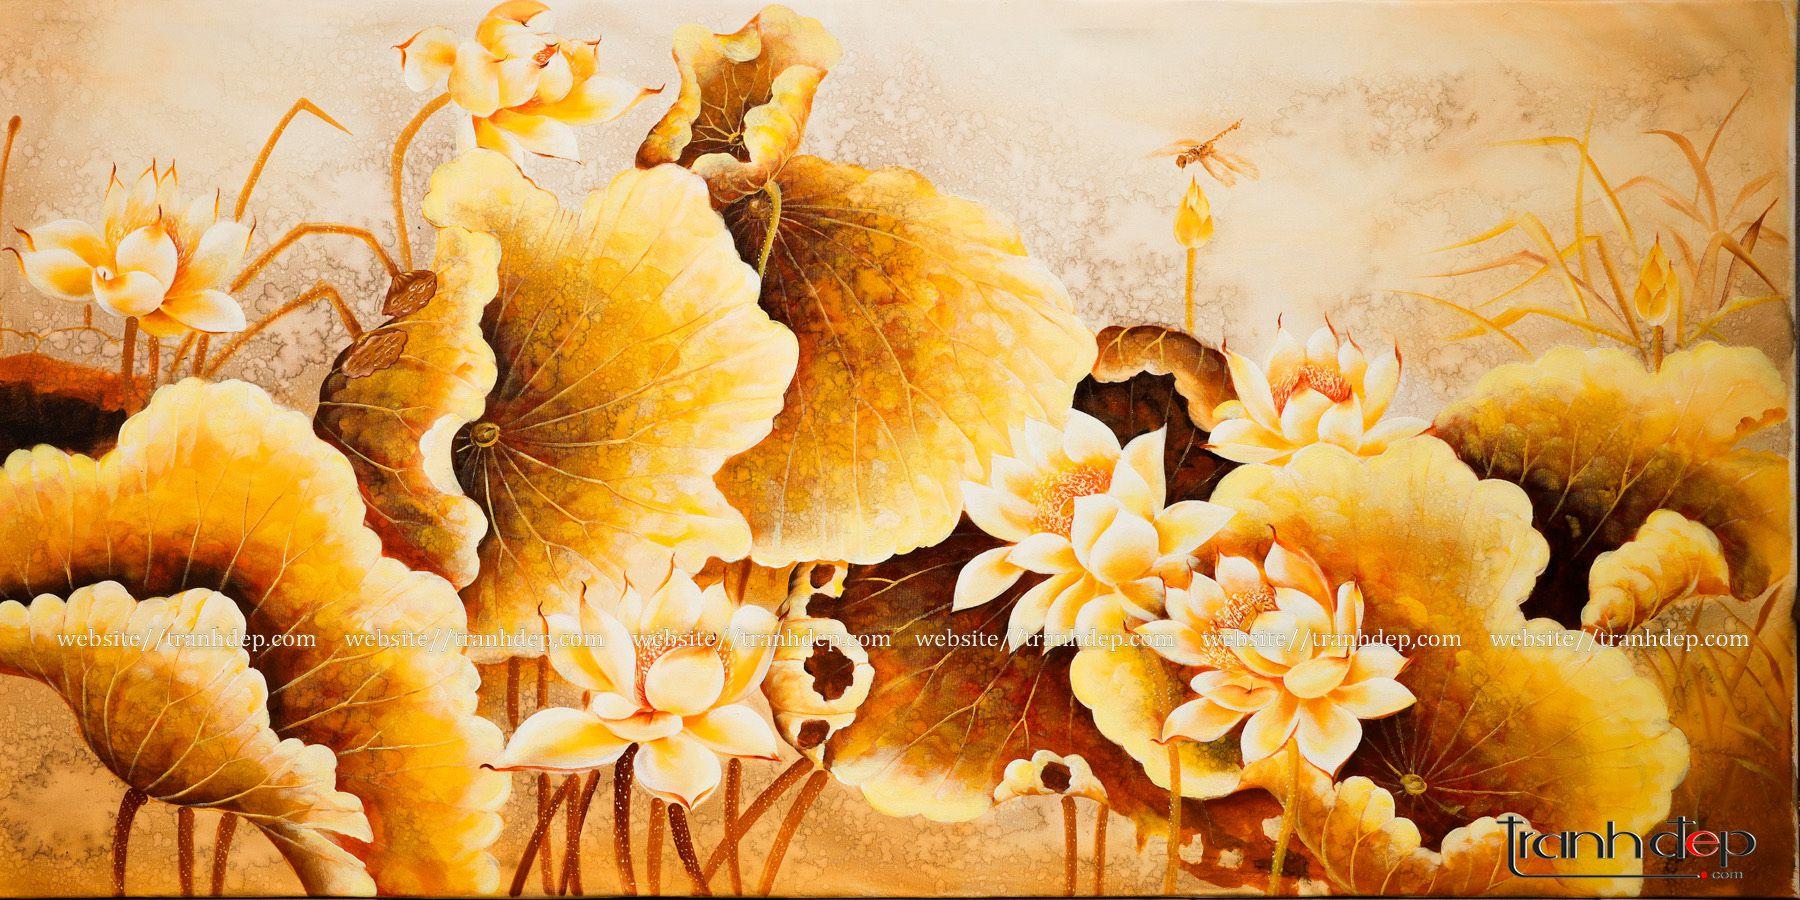 tranh hoa sen